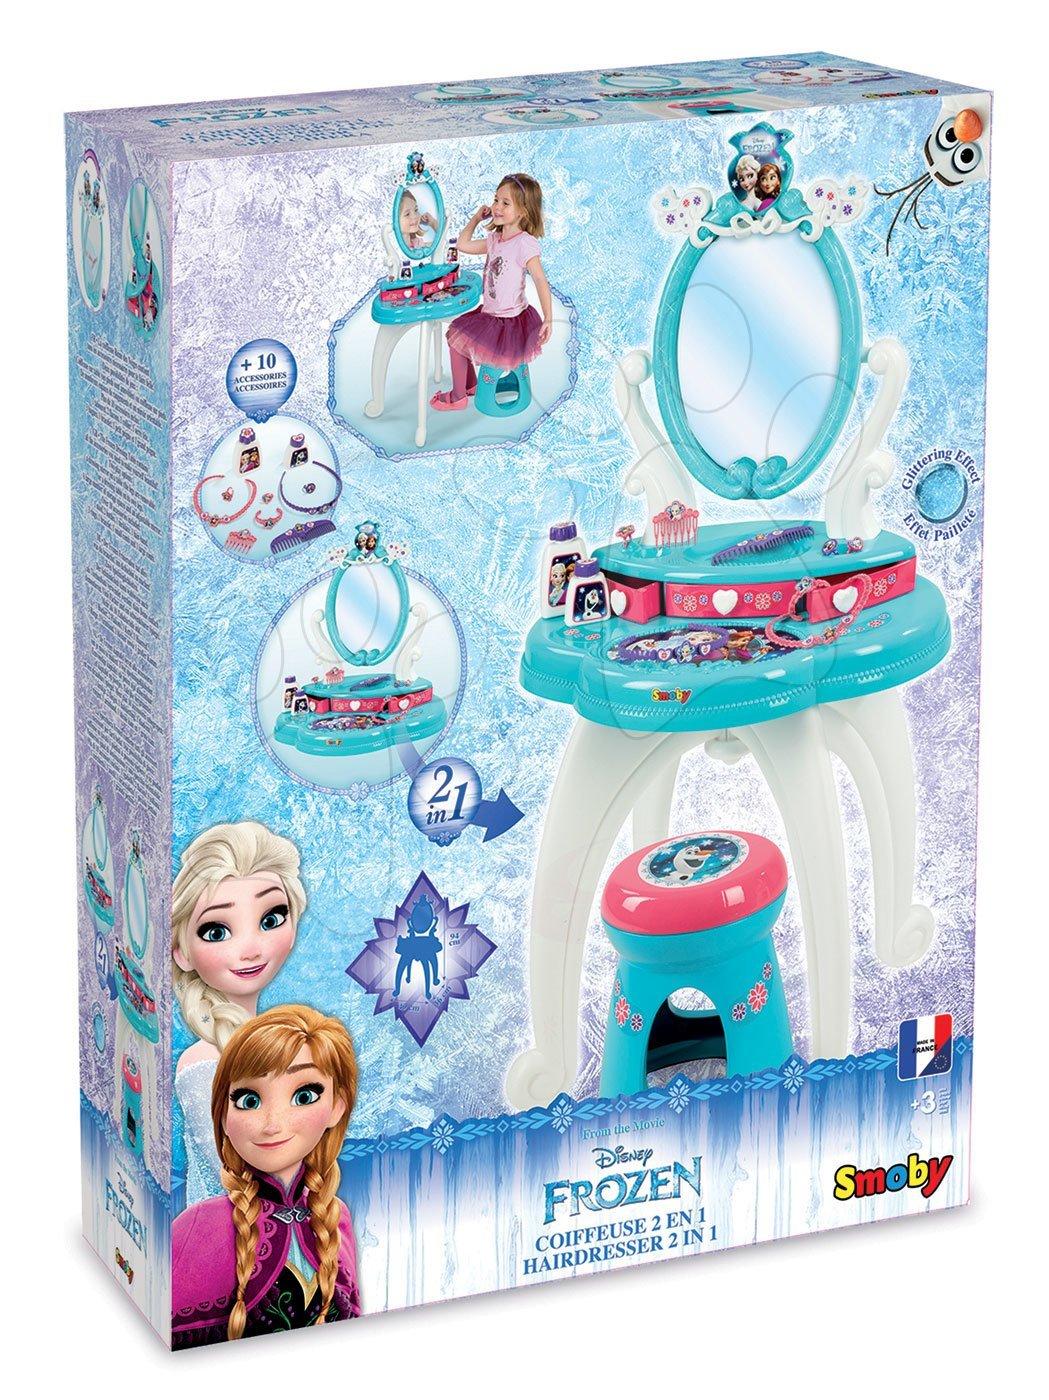 8c67ab5b514b Detský kozmetický stolík Disney Frozen Smoby 2v1 so stoličkou a 10  doplnkami 320214 akvamarínový